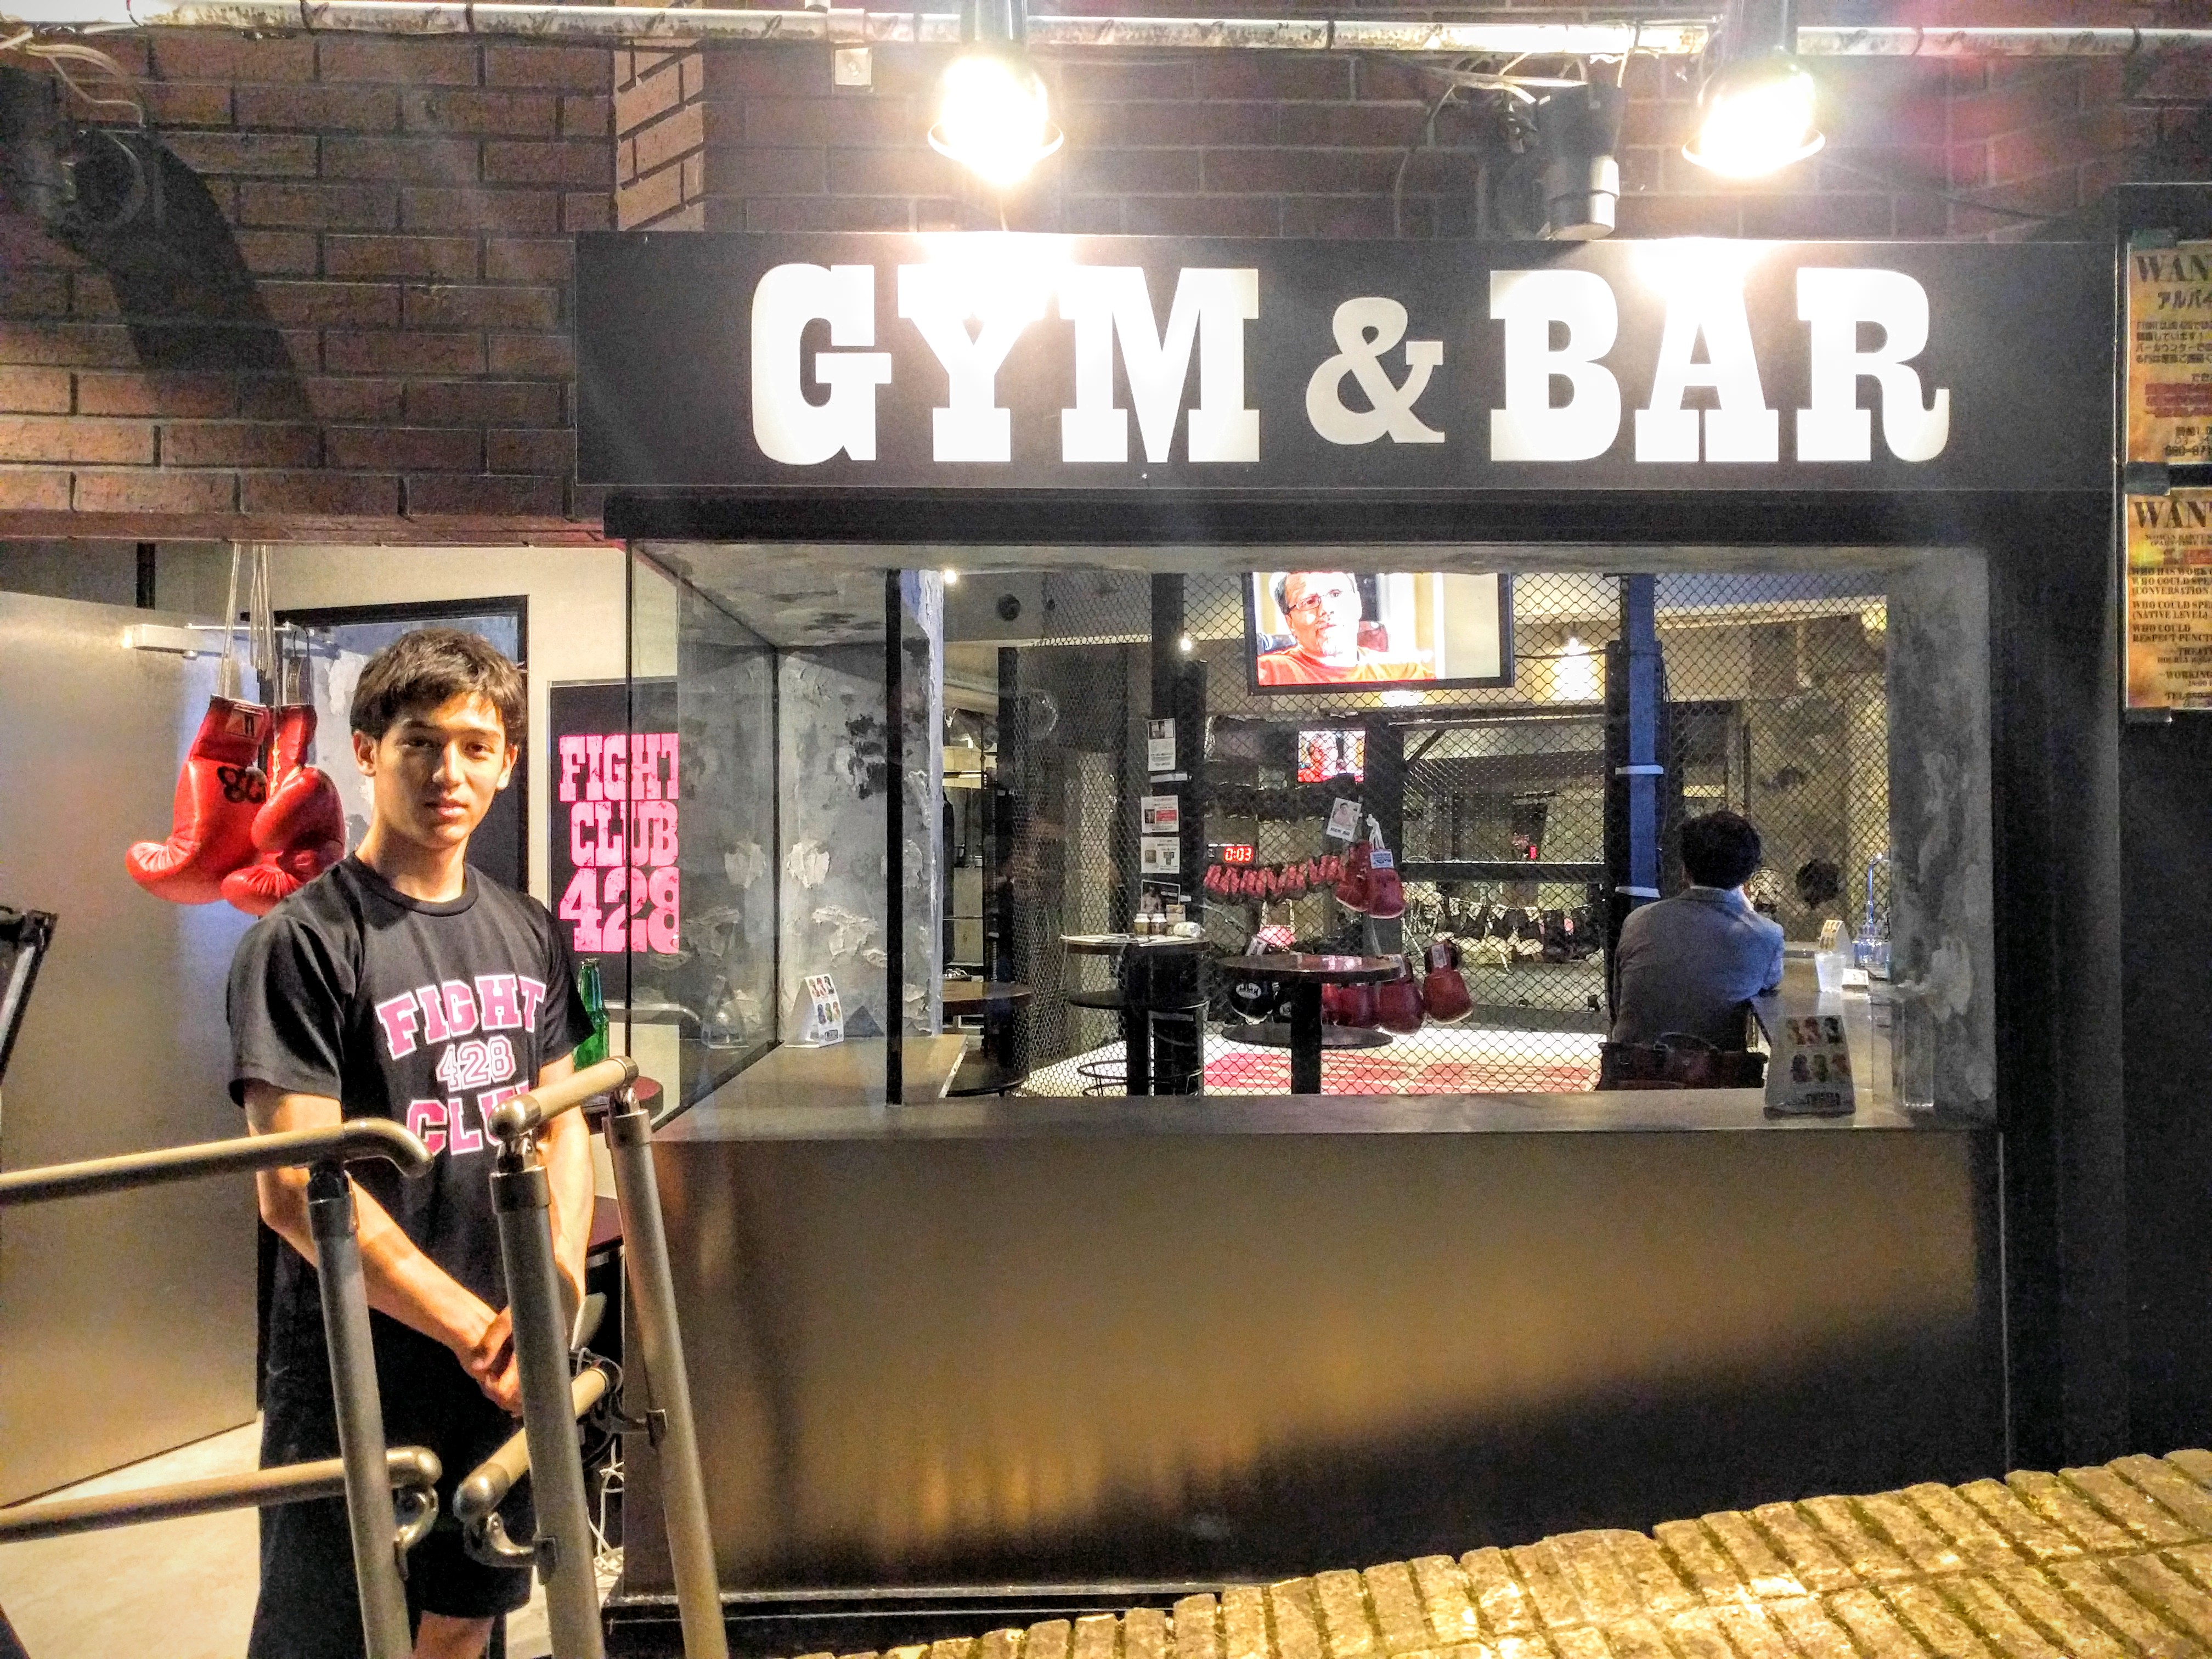 Fight Club 428 – Bar in Shibuya | Tokyo Cheapo